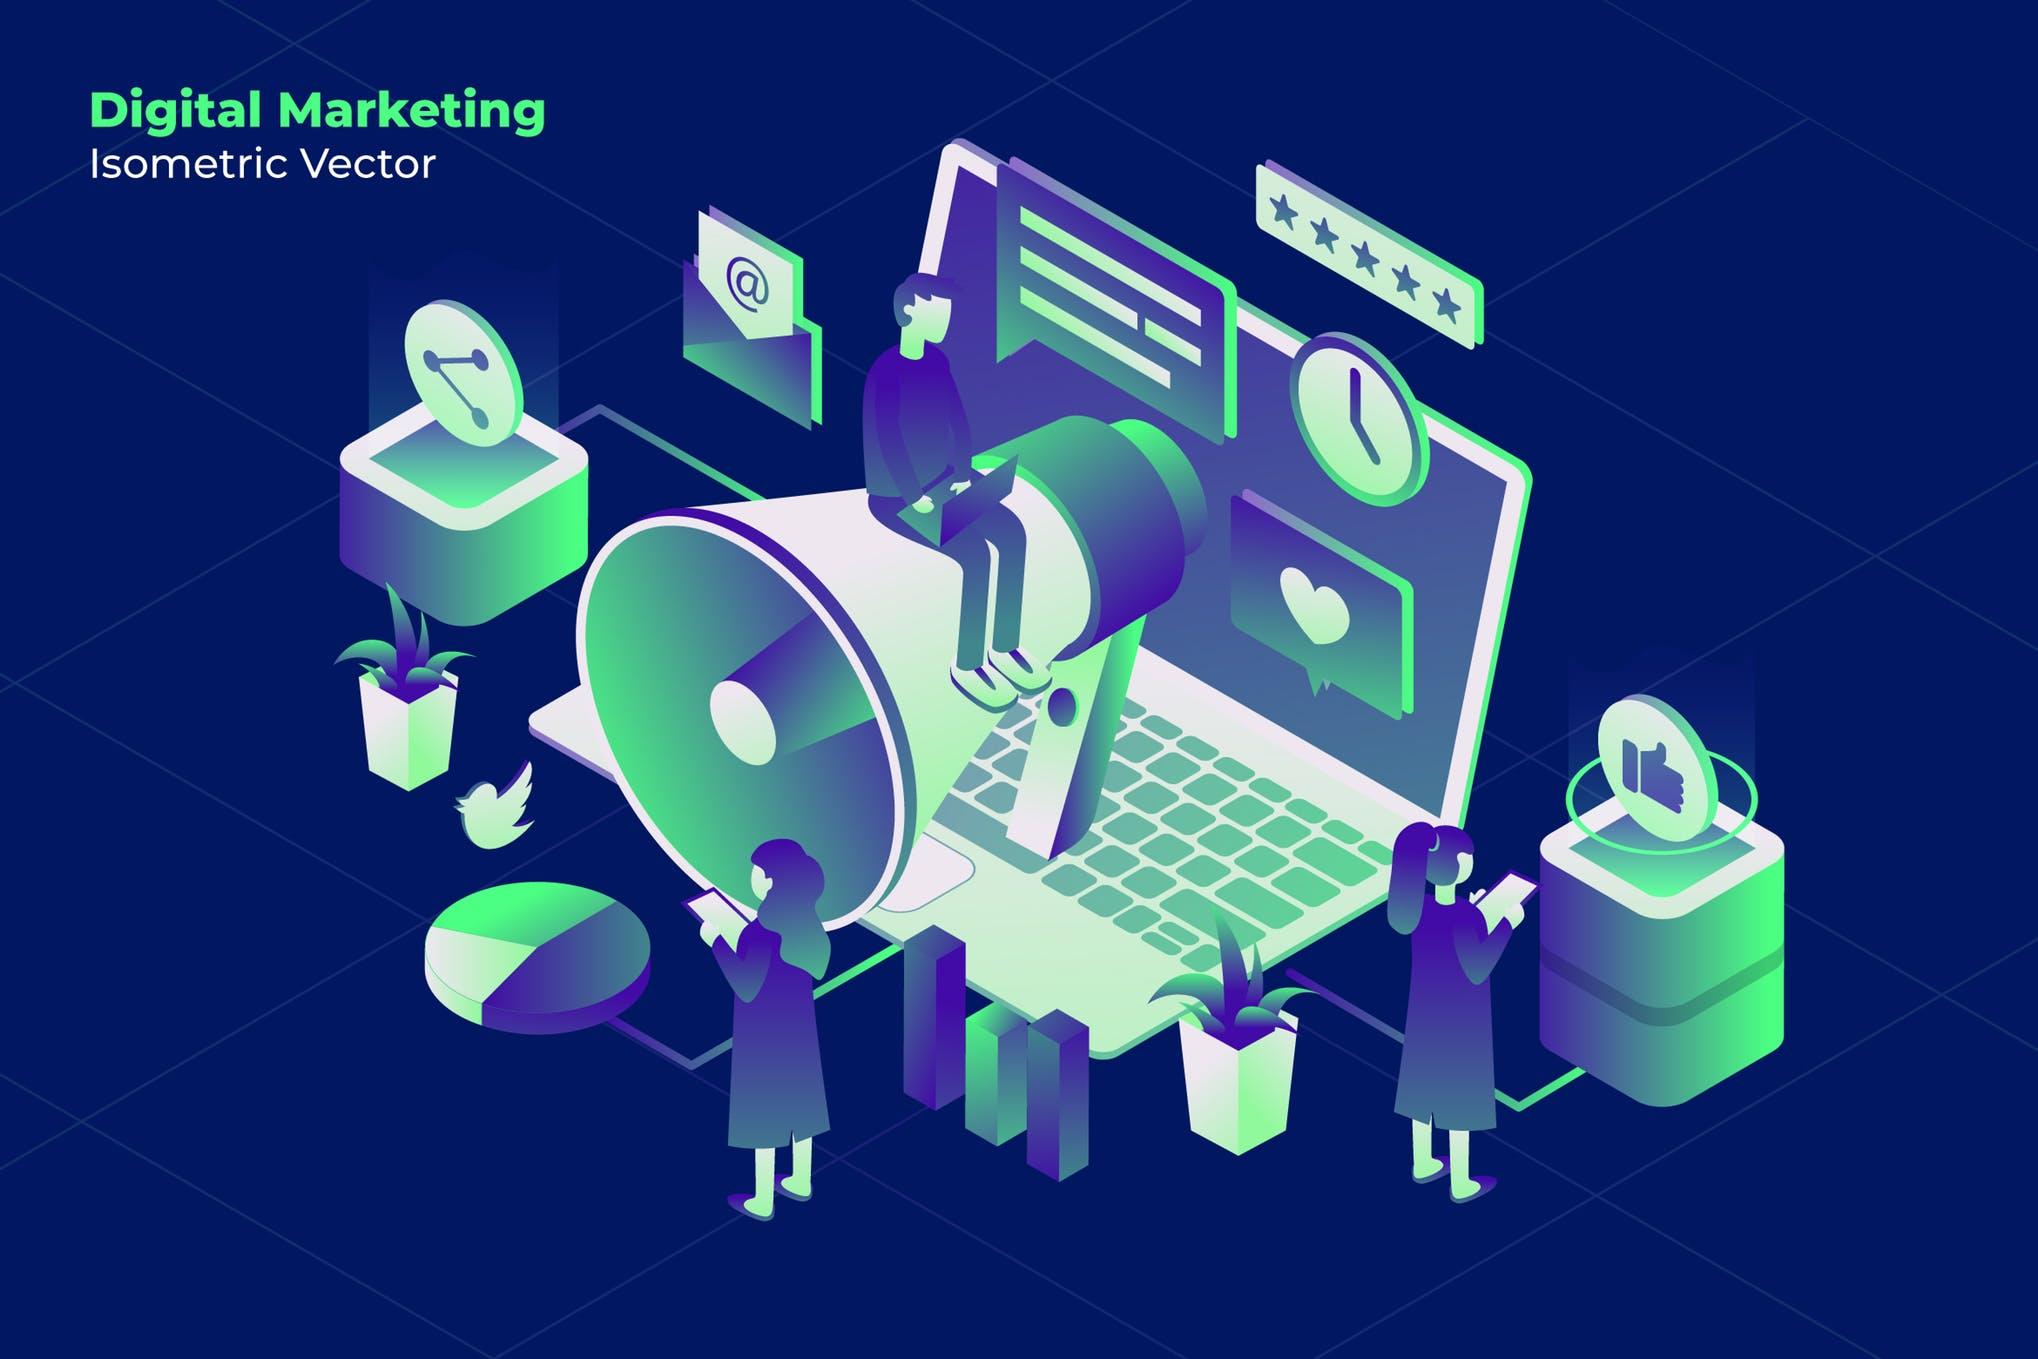 在线营销2.5D插画创意设计方案Marketing Online - Vector Illustration